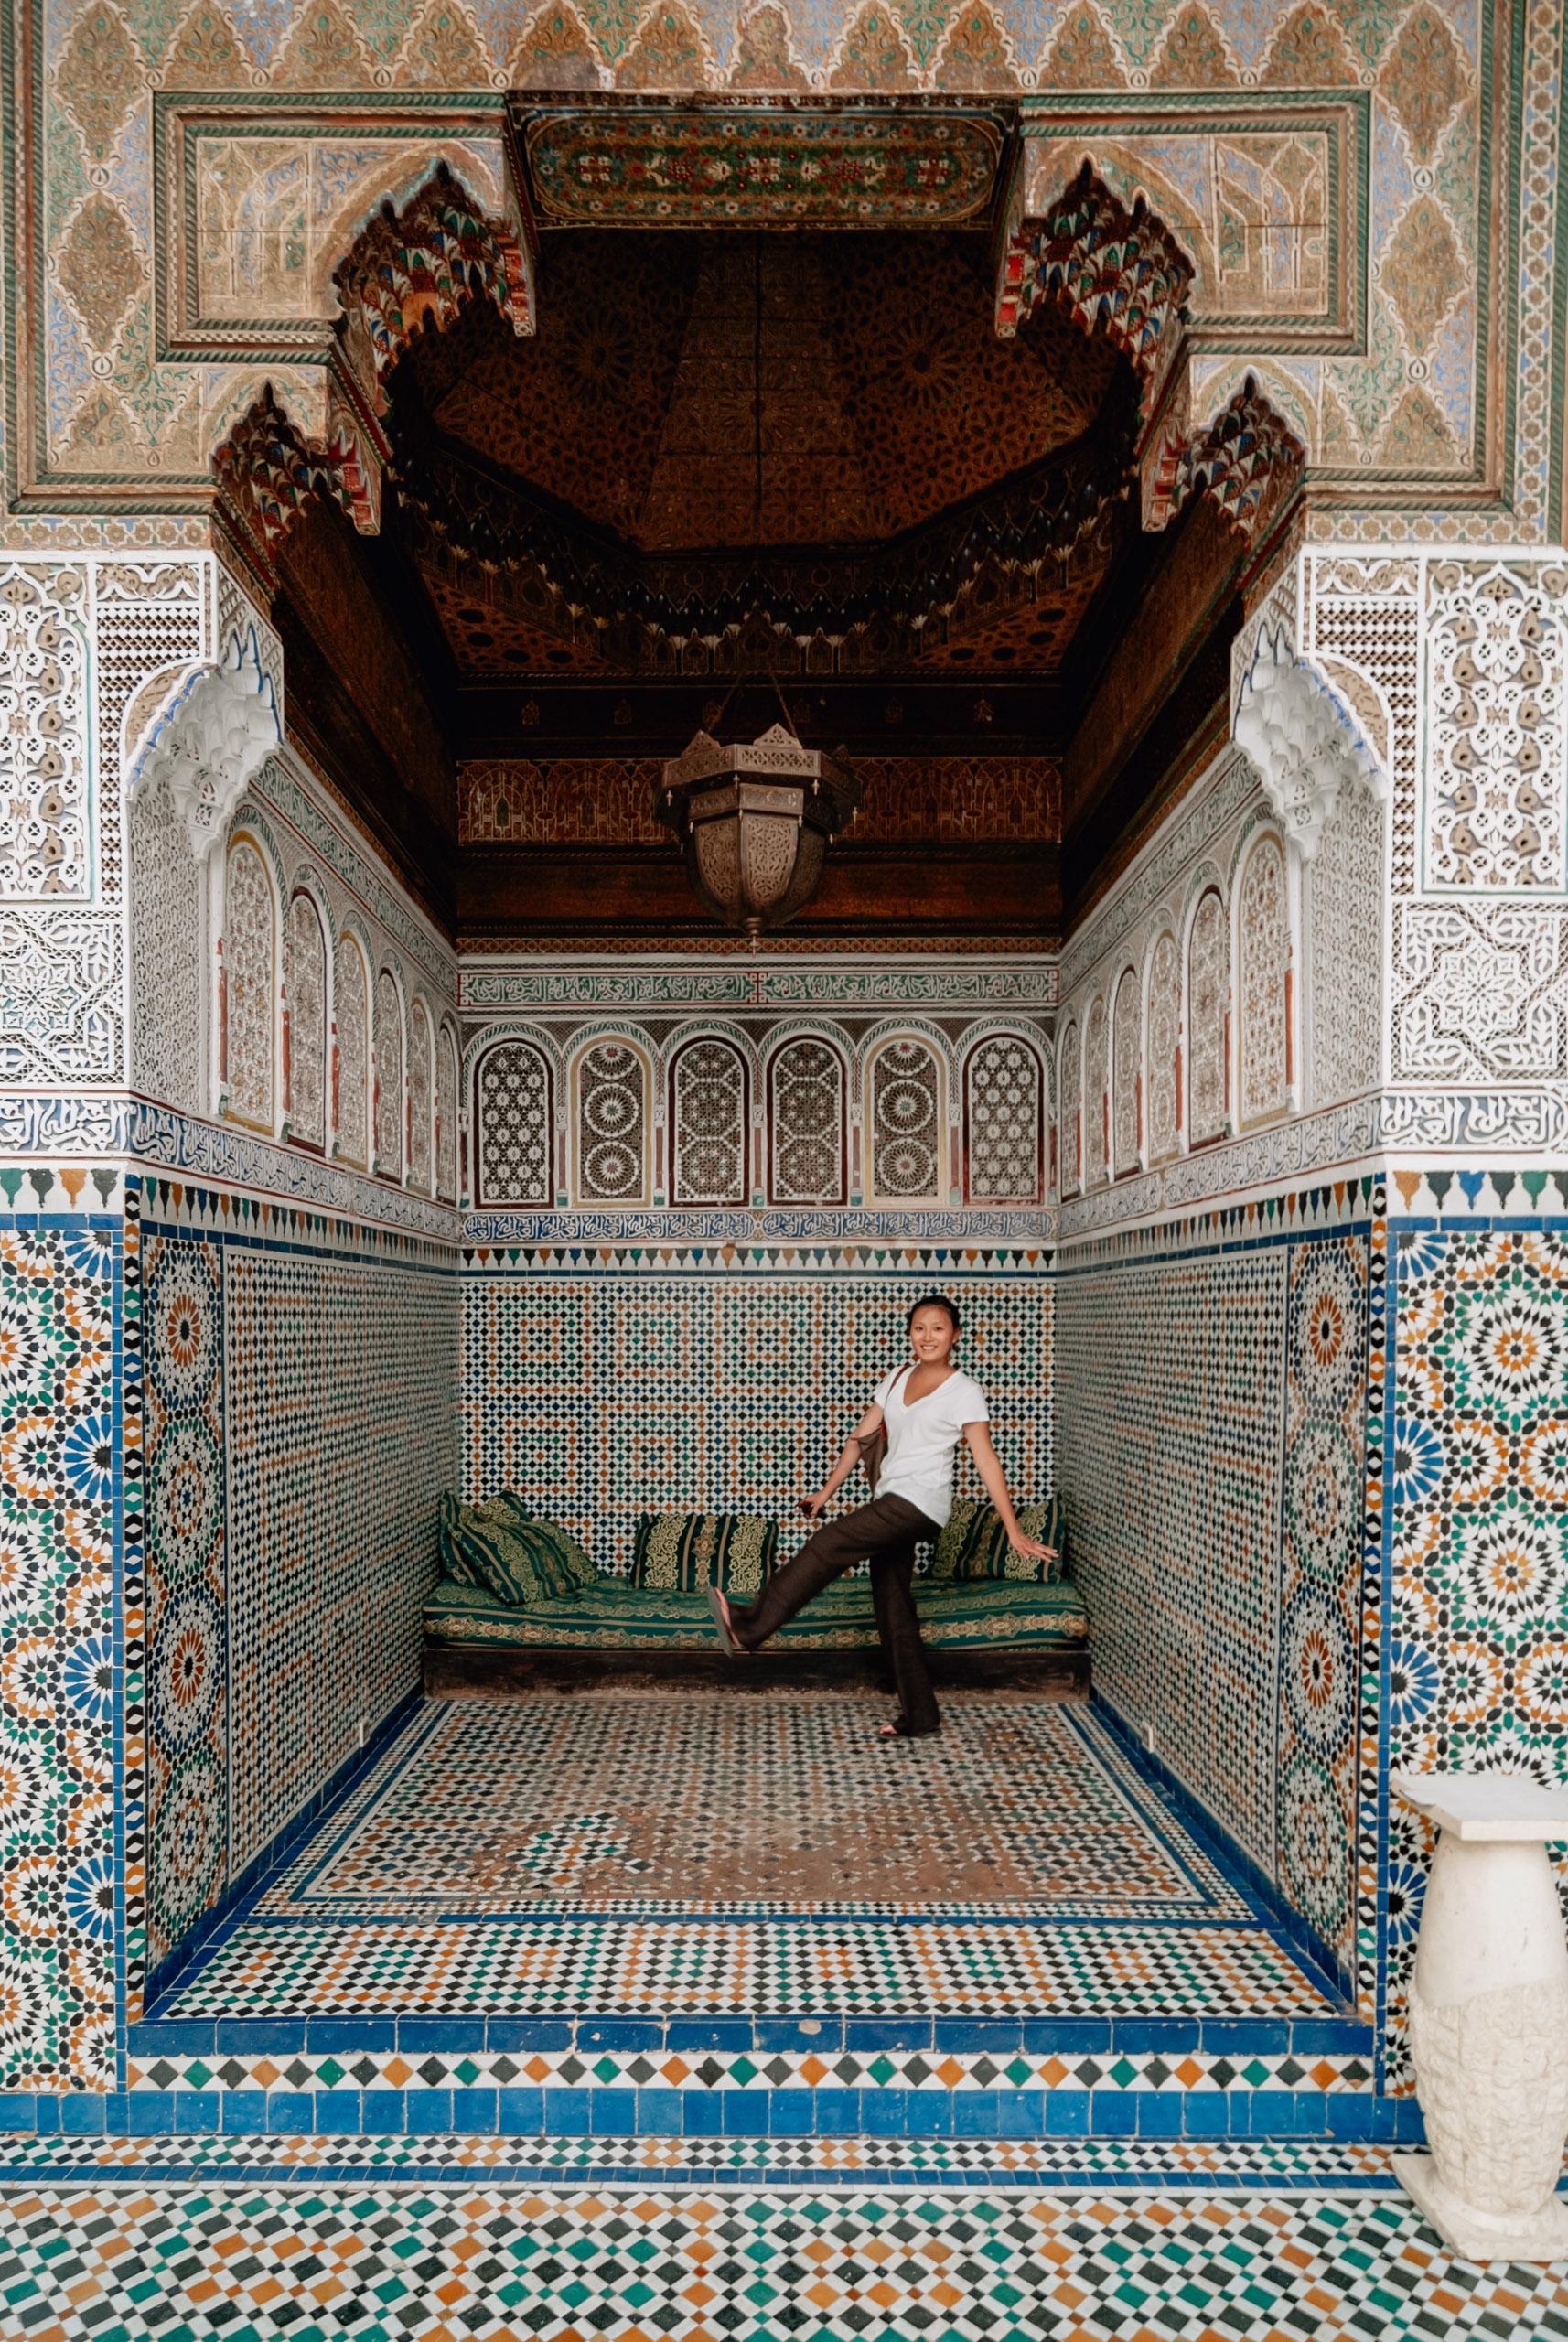 Morocco - 2008-0903-DSC_0095_23389